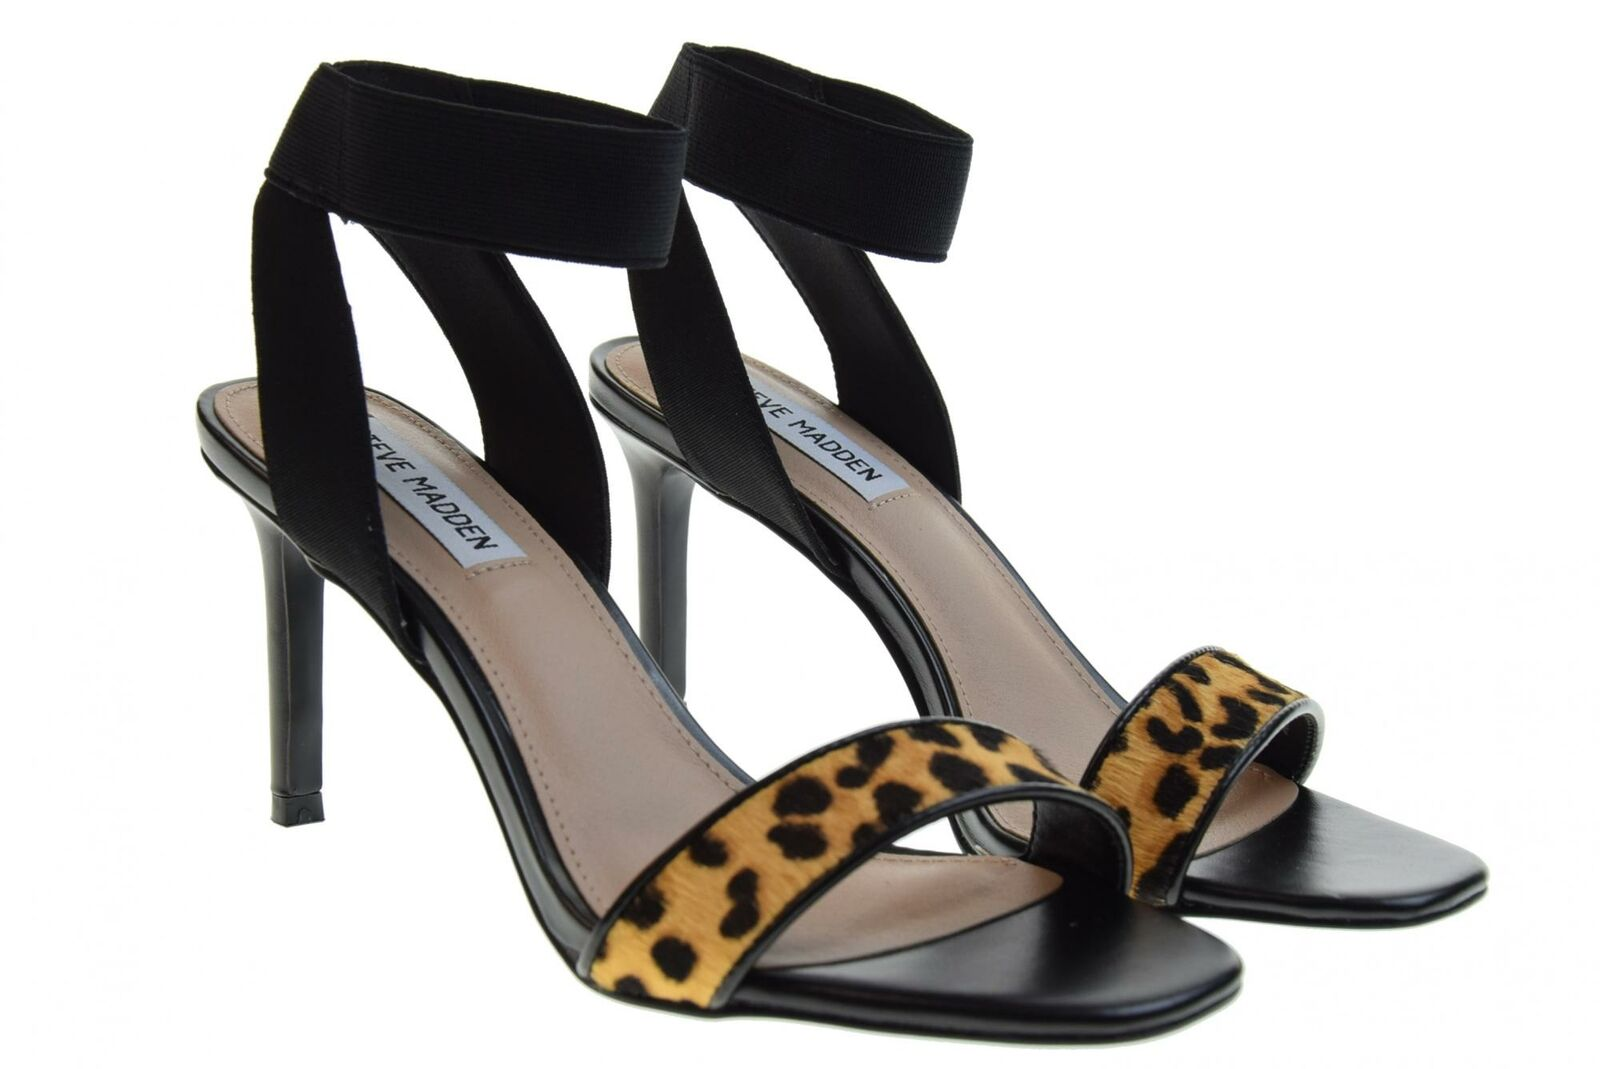 Steve Madden P19s chaussures femmes FONDU LEOPARDATO sandalias de tacón